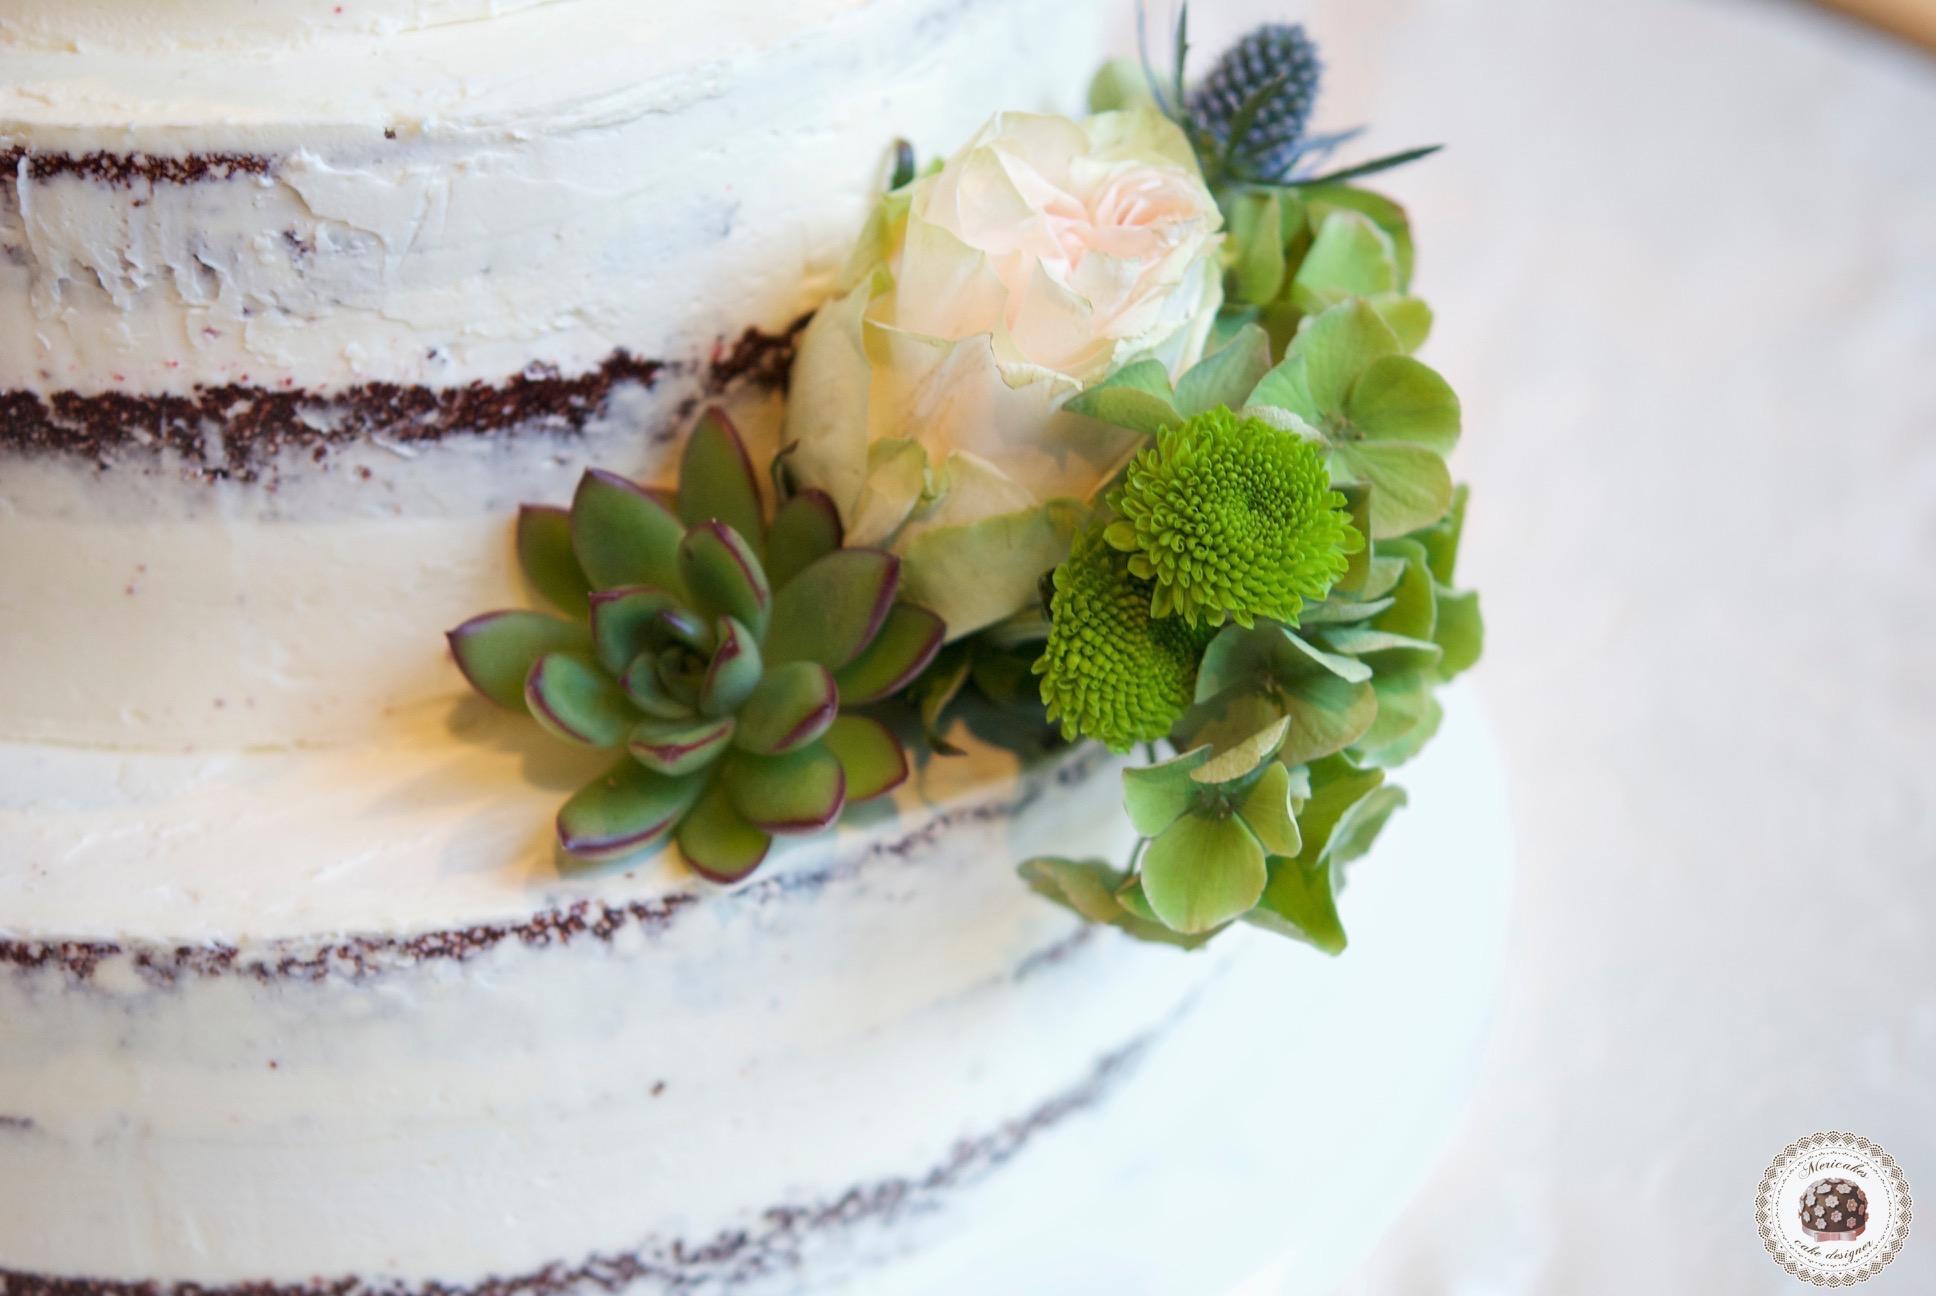 Meritxell-Montserrat-Meri-Cakes-Wedding-Elegant-28-1.jpg#asset:16130